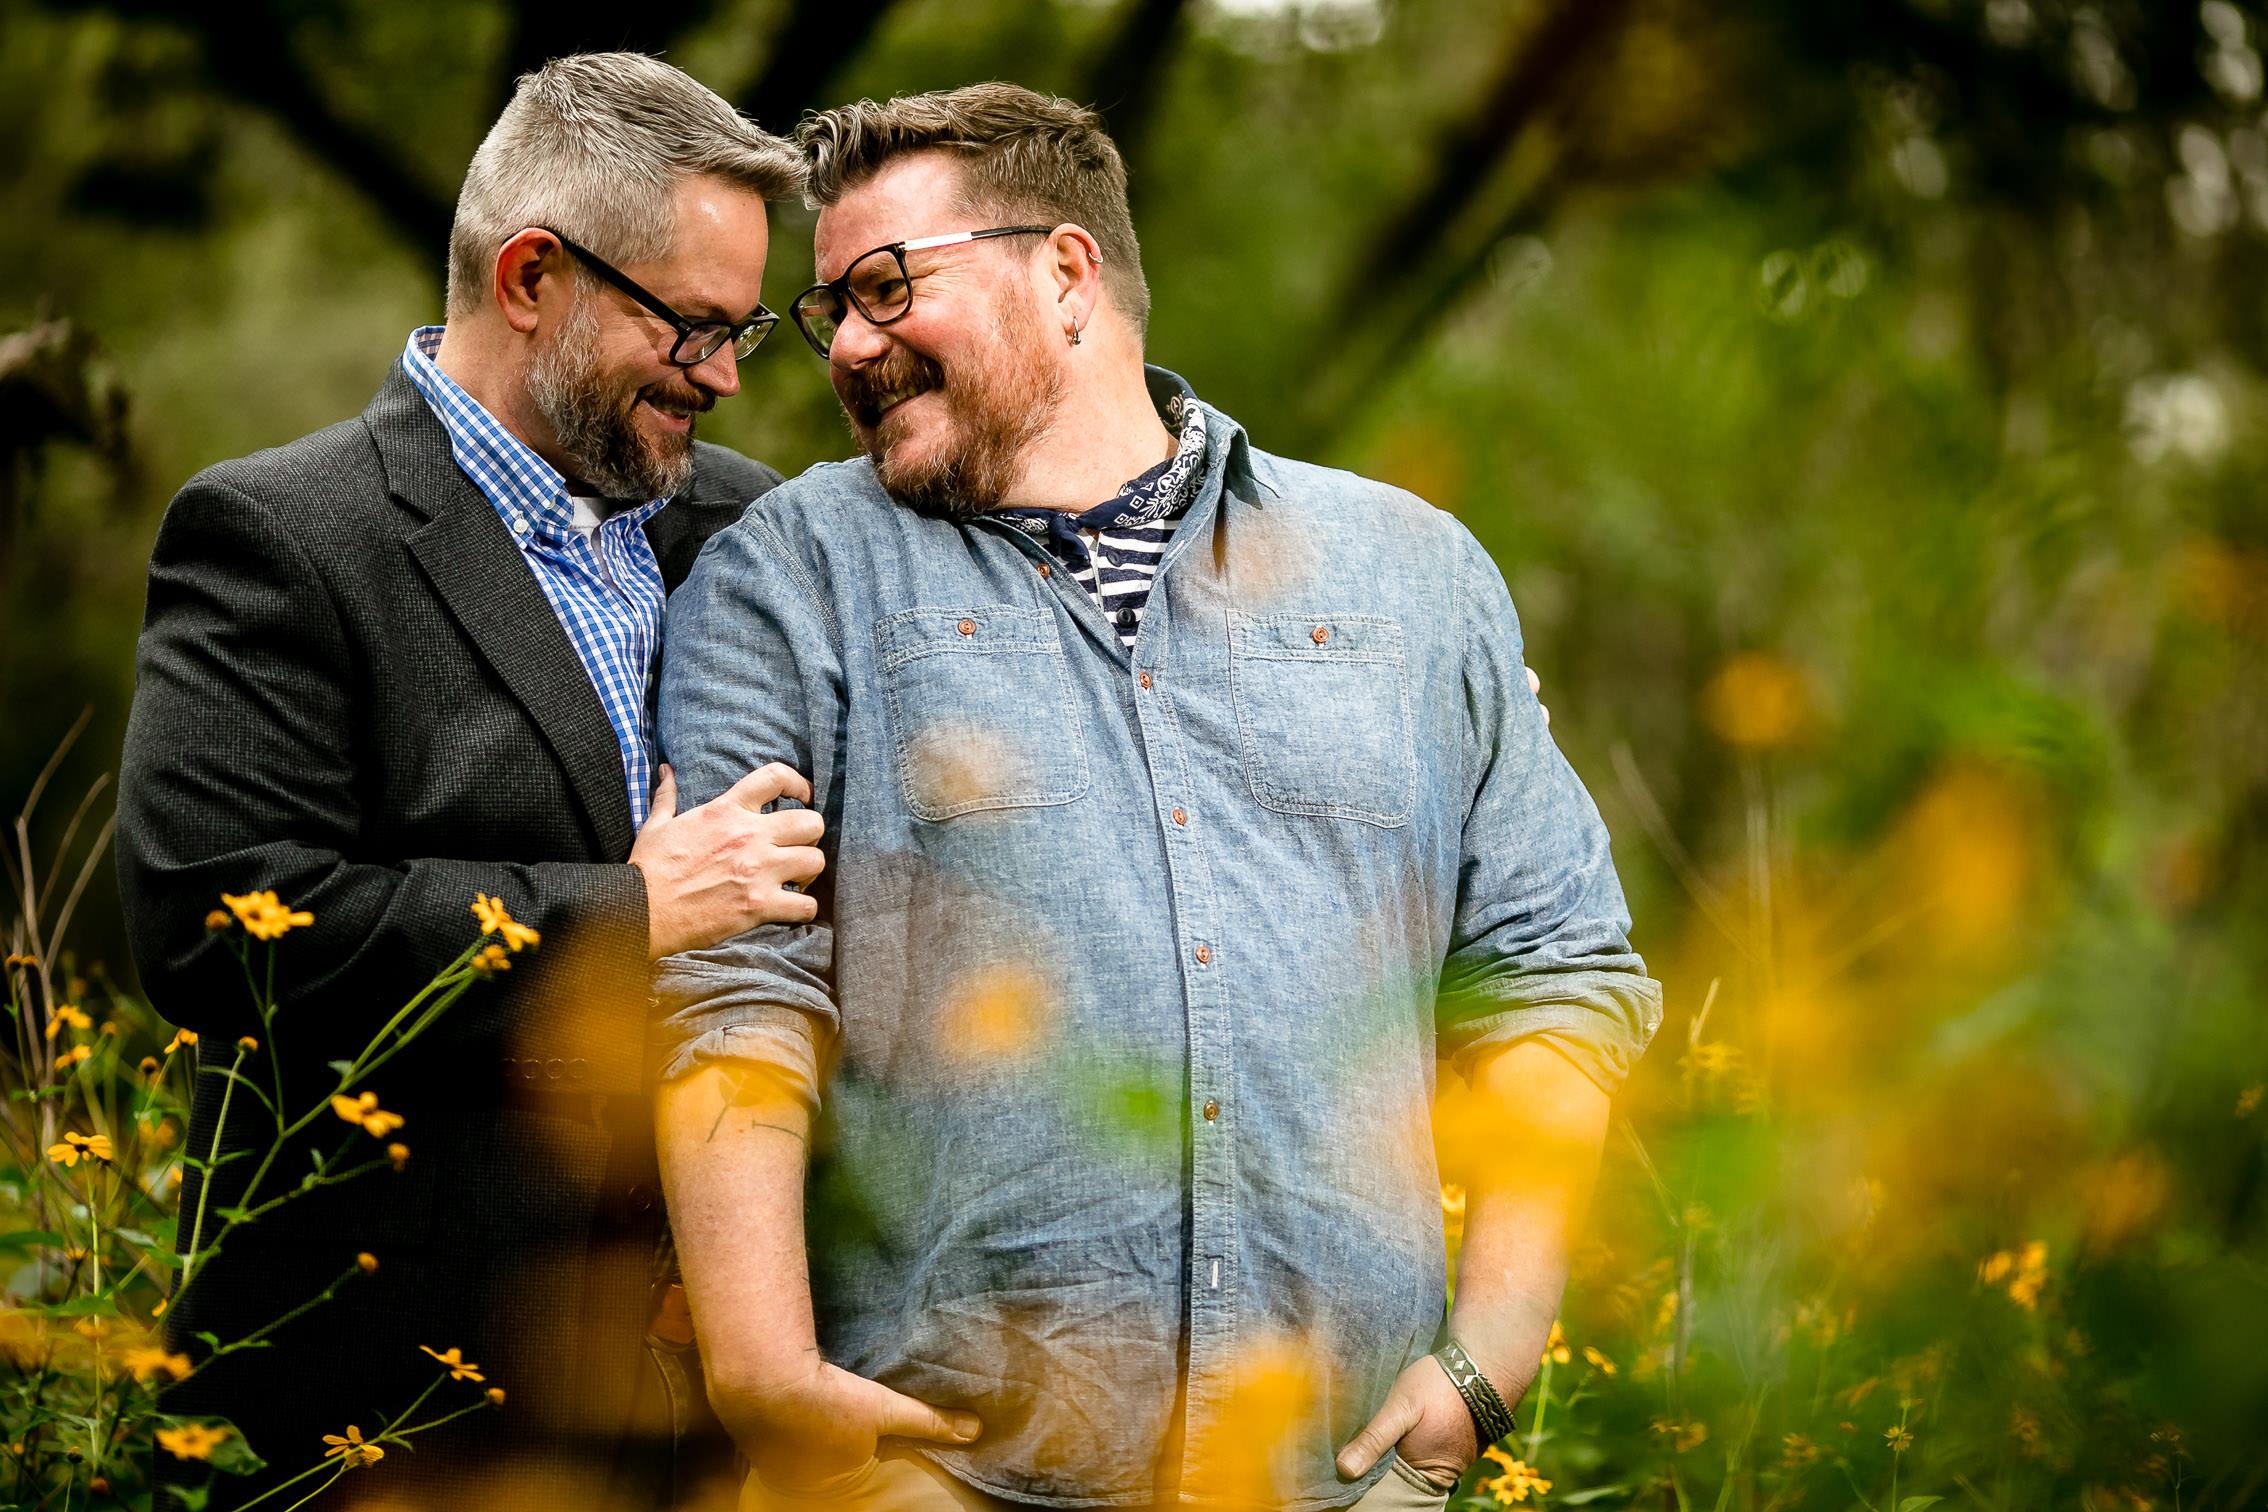 Chris & Adam // LGBT engagement photographer